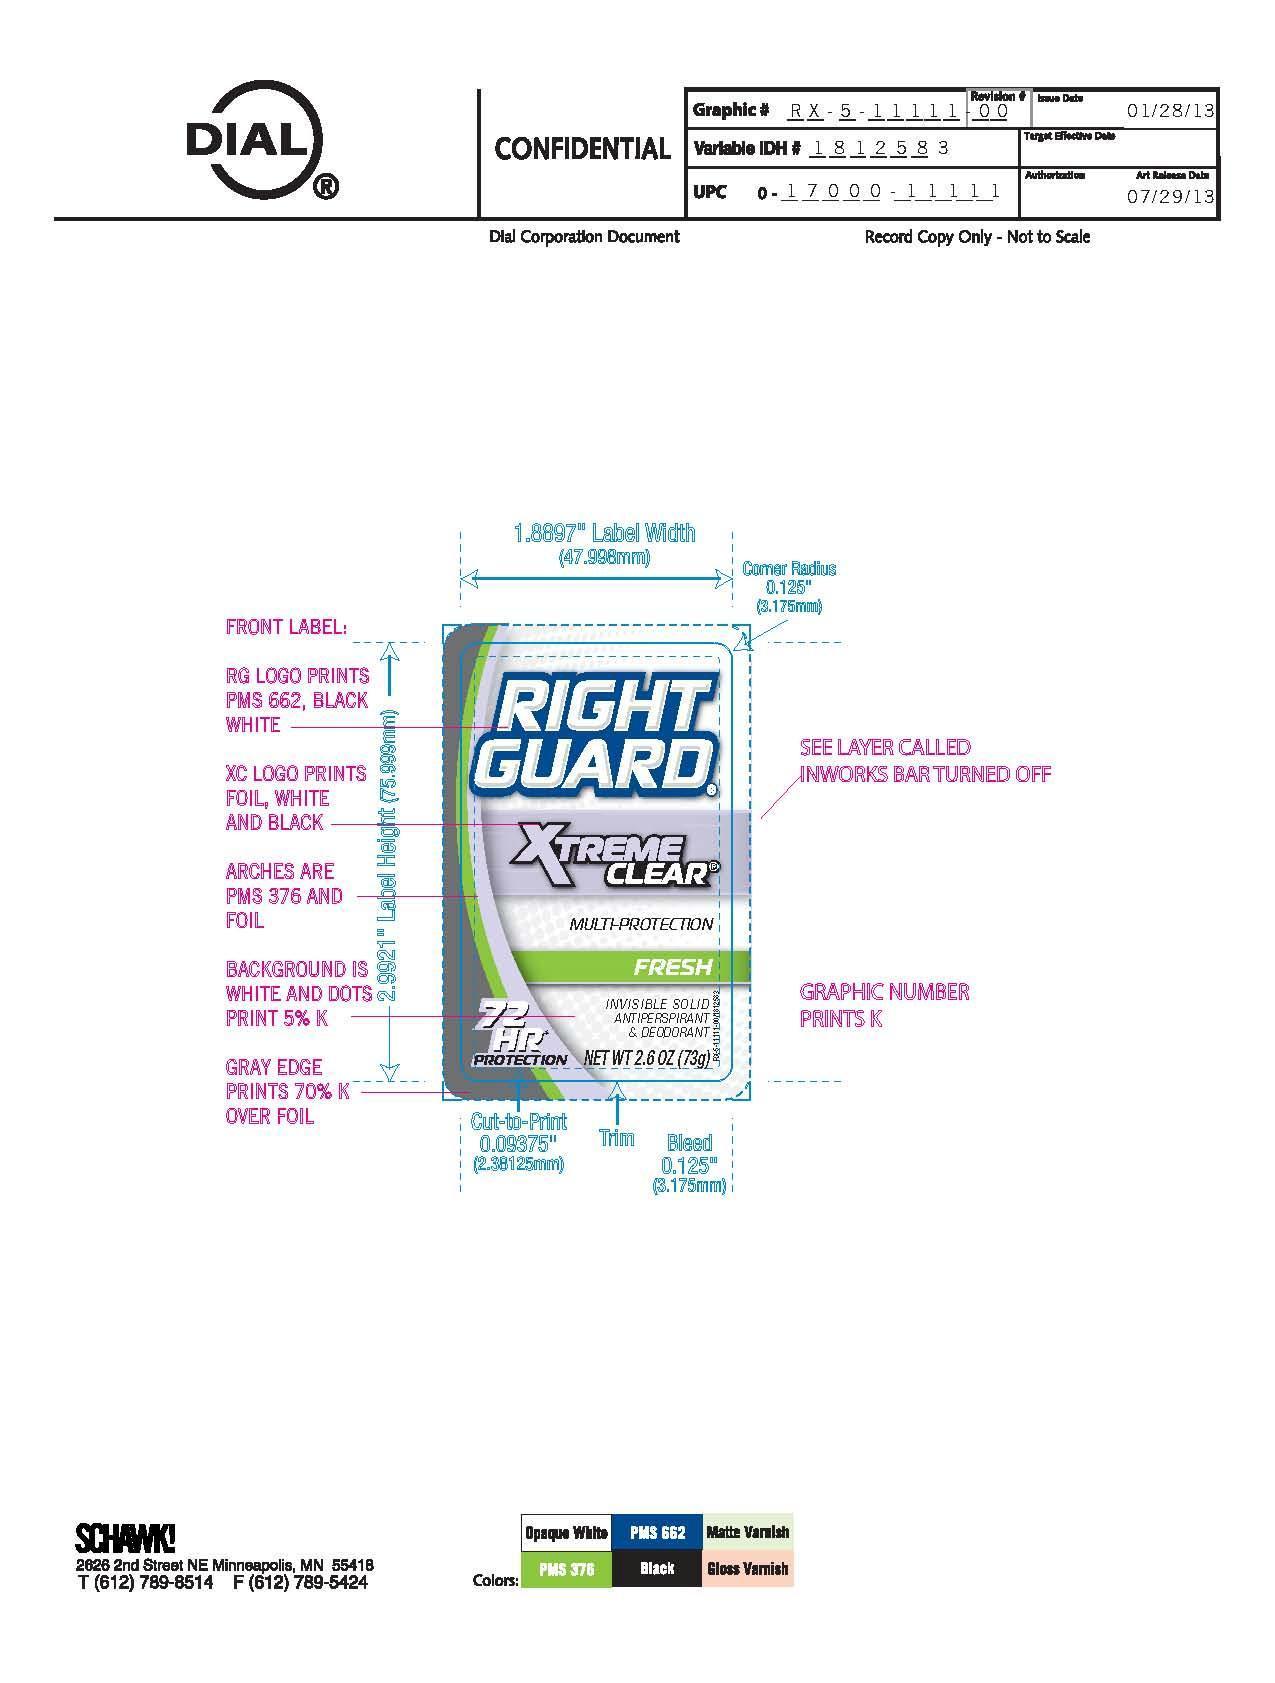 Right Guard Xtreme Clear Fresh (Aluminum Zirconium Tetrachlorohydrex) Stick [Vvf Illinois Services Llc]